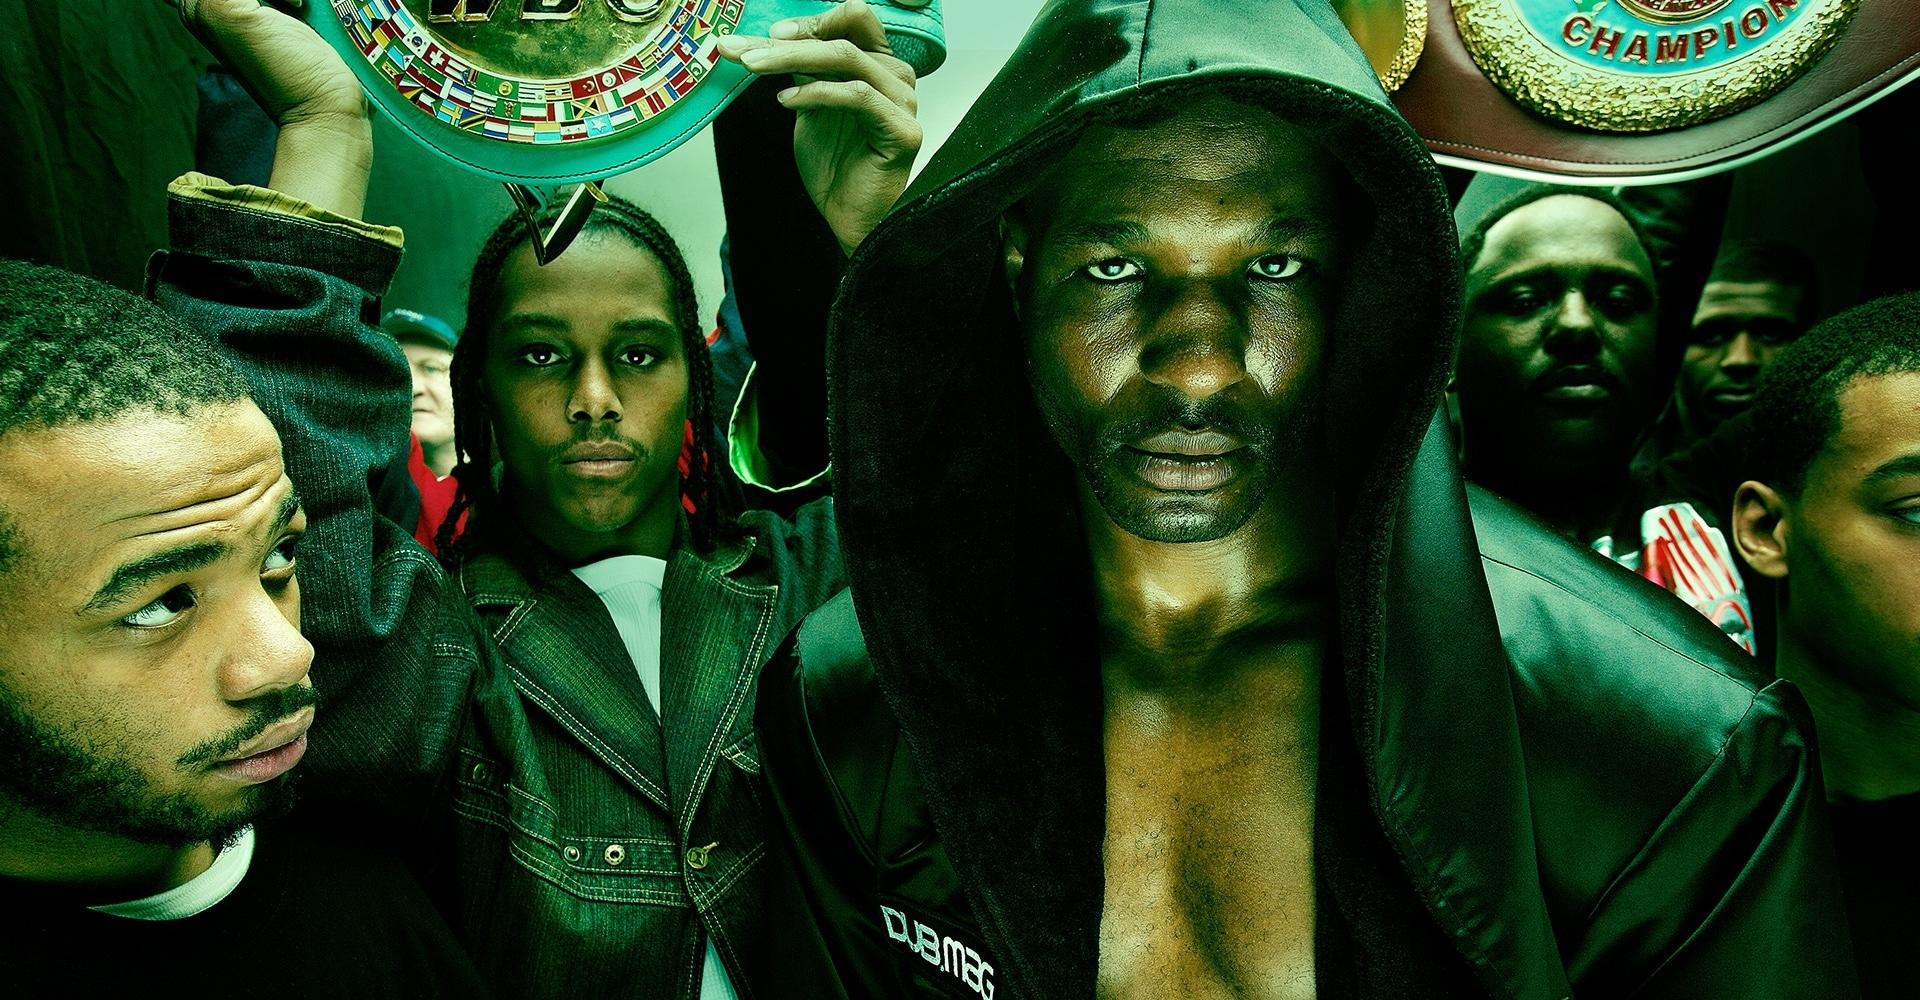 Boxer Bernard Hopkins and posse - Philadelphia, PA